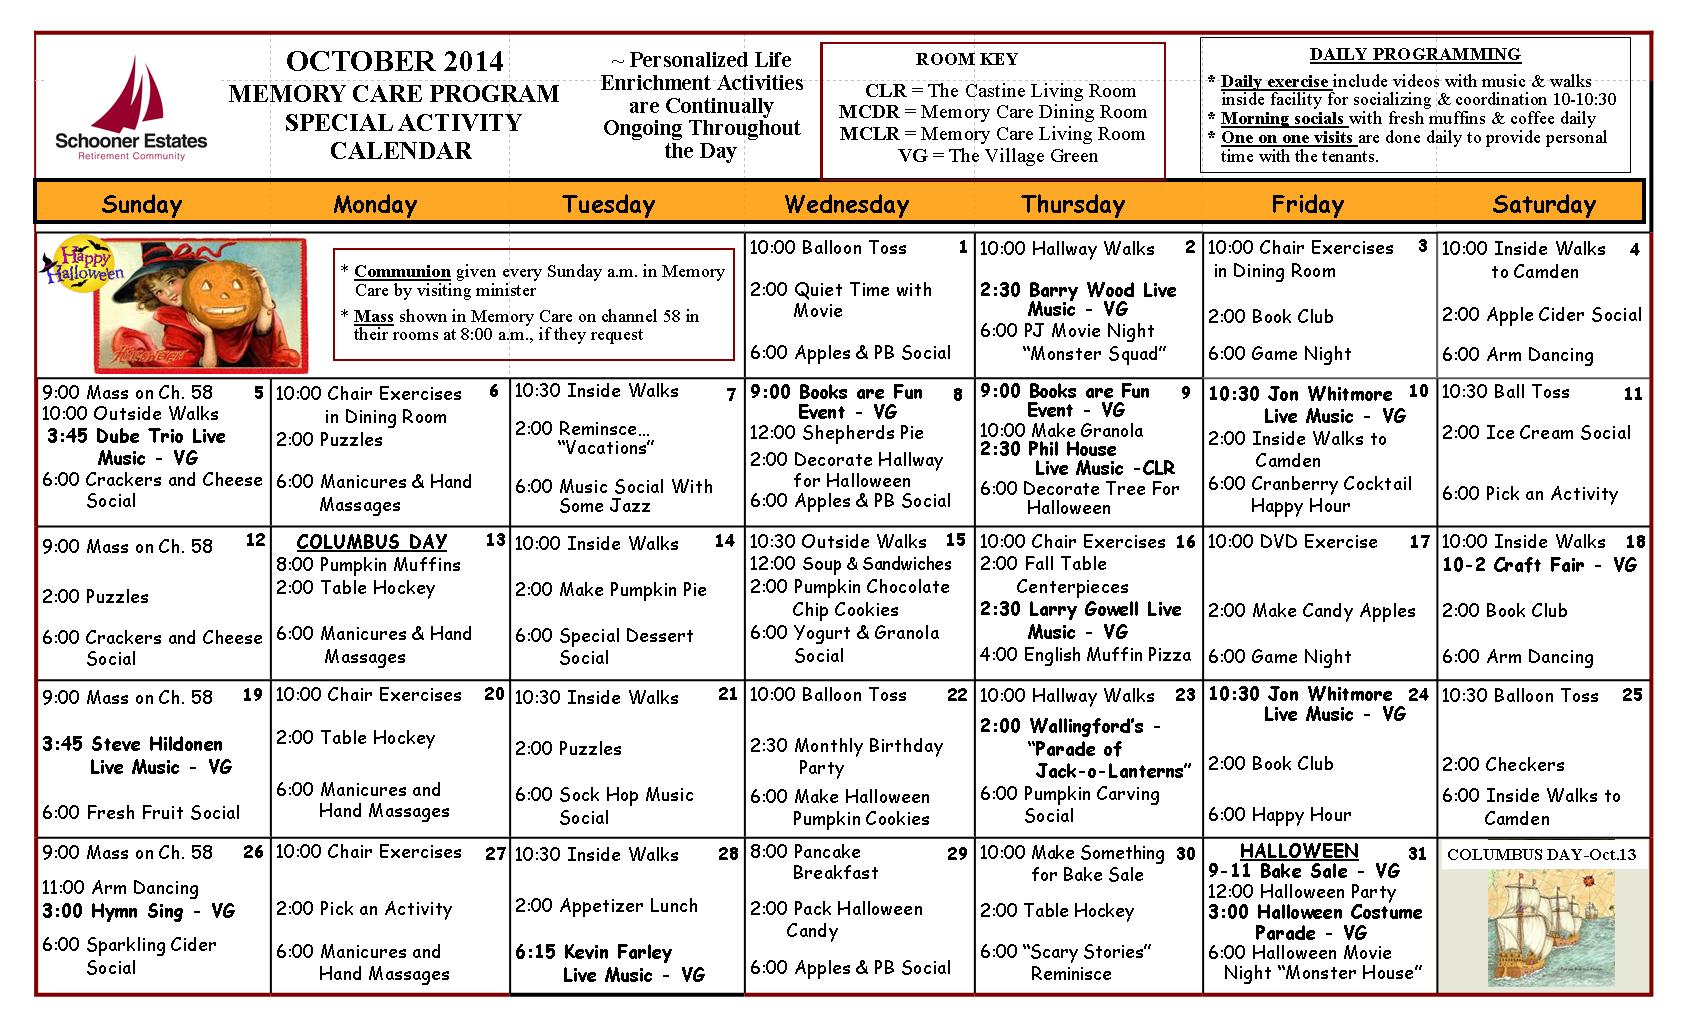 October 2014 Memory Care Calendar